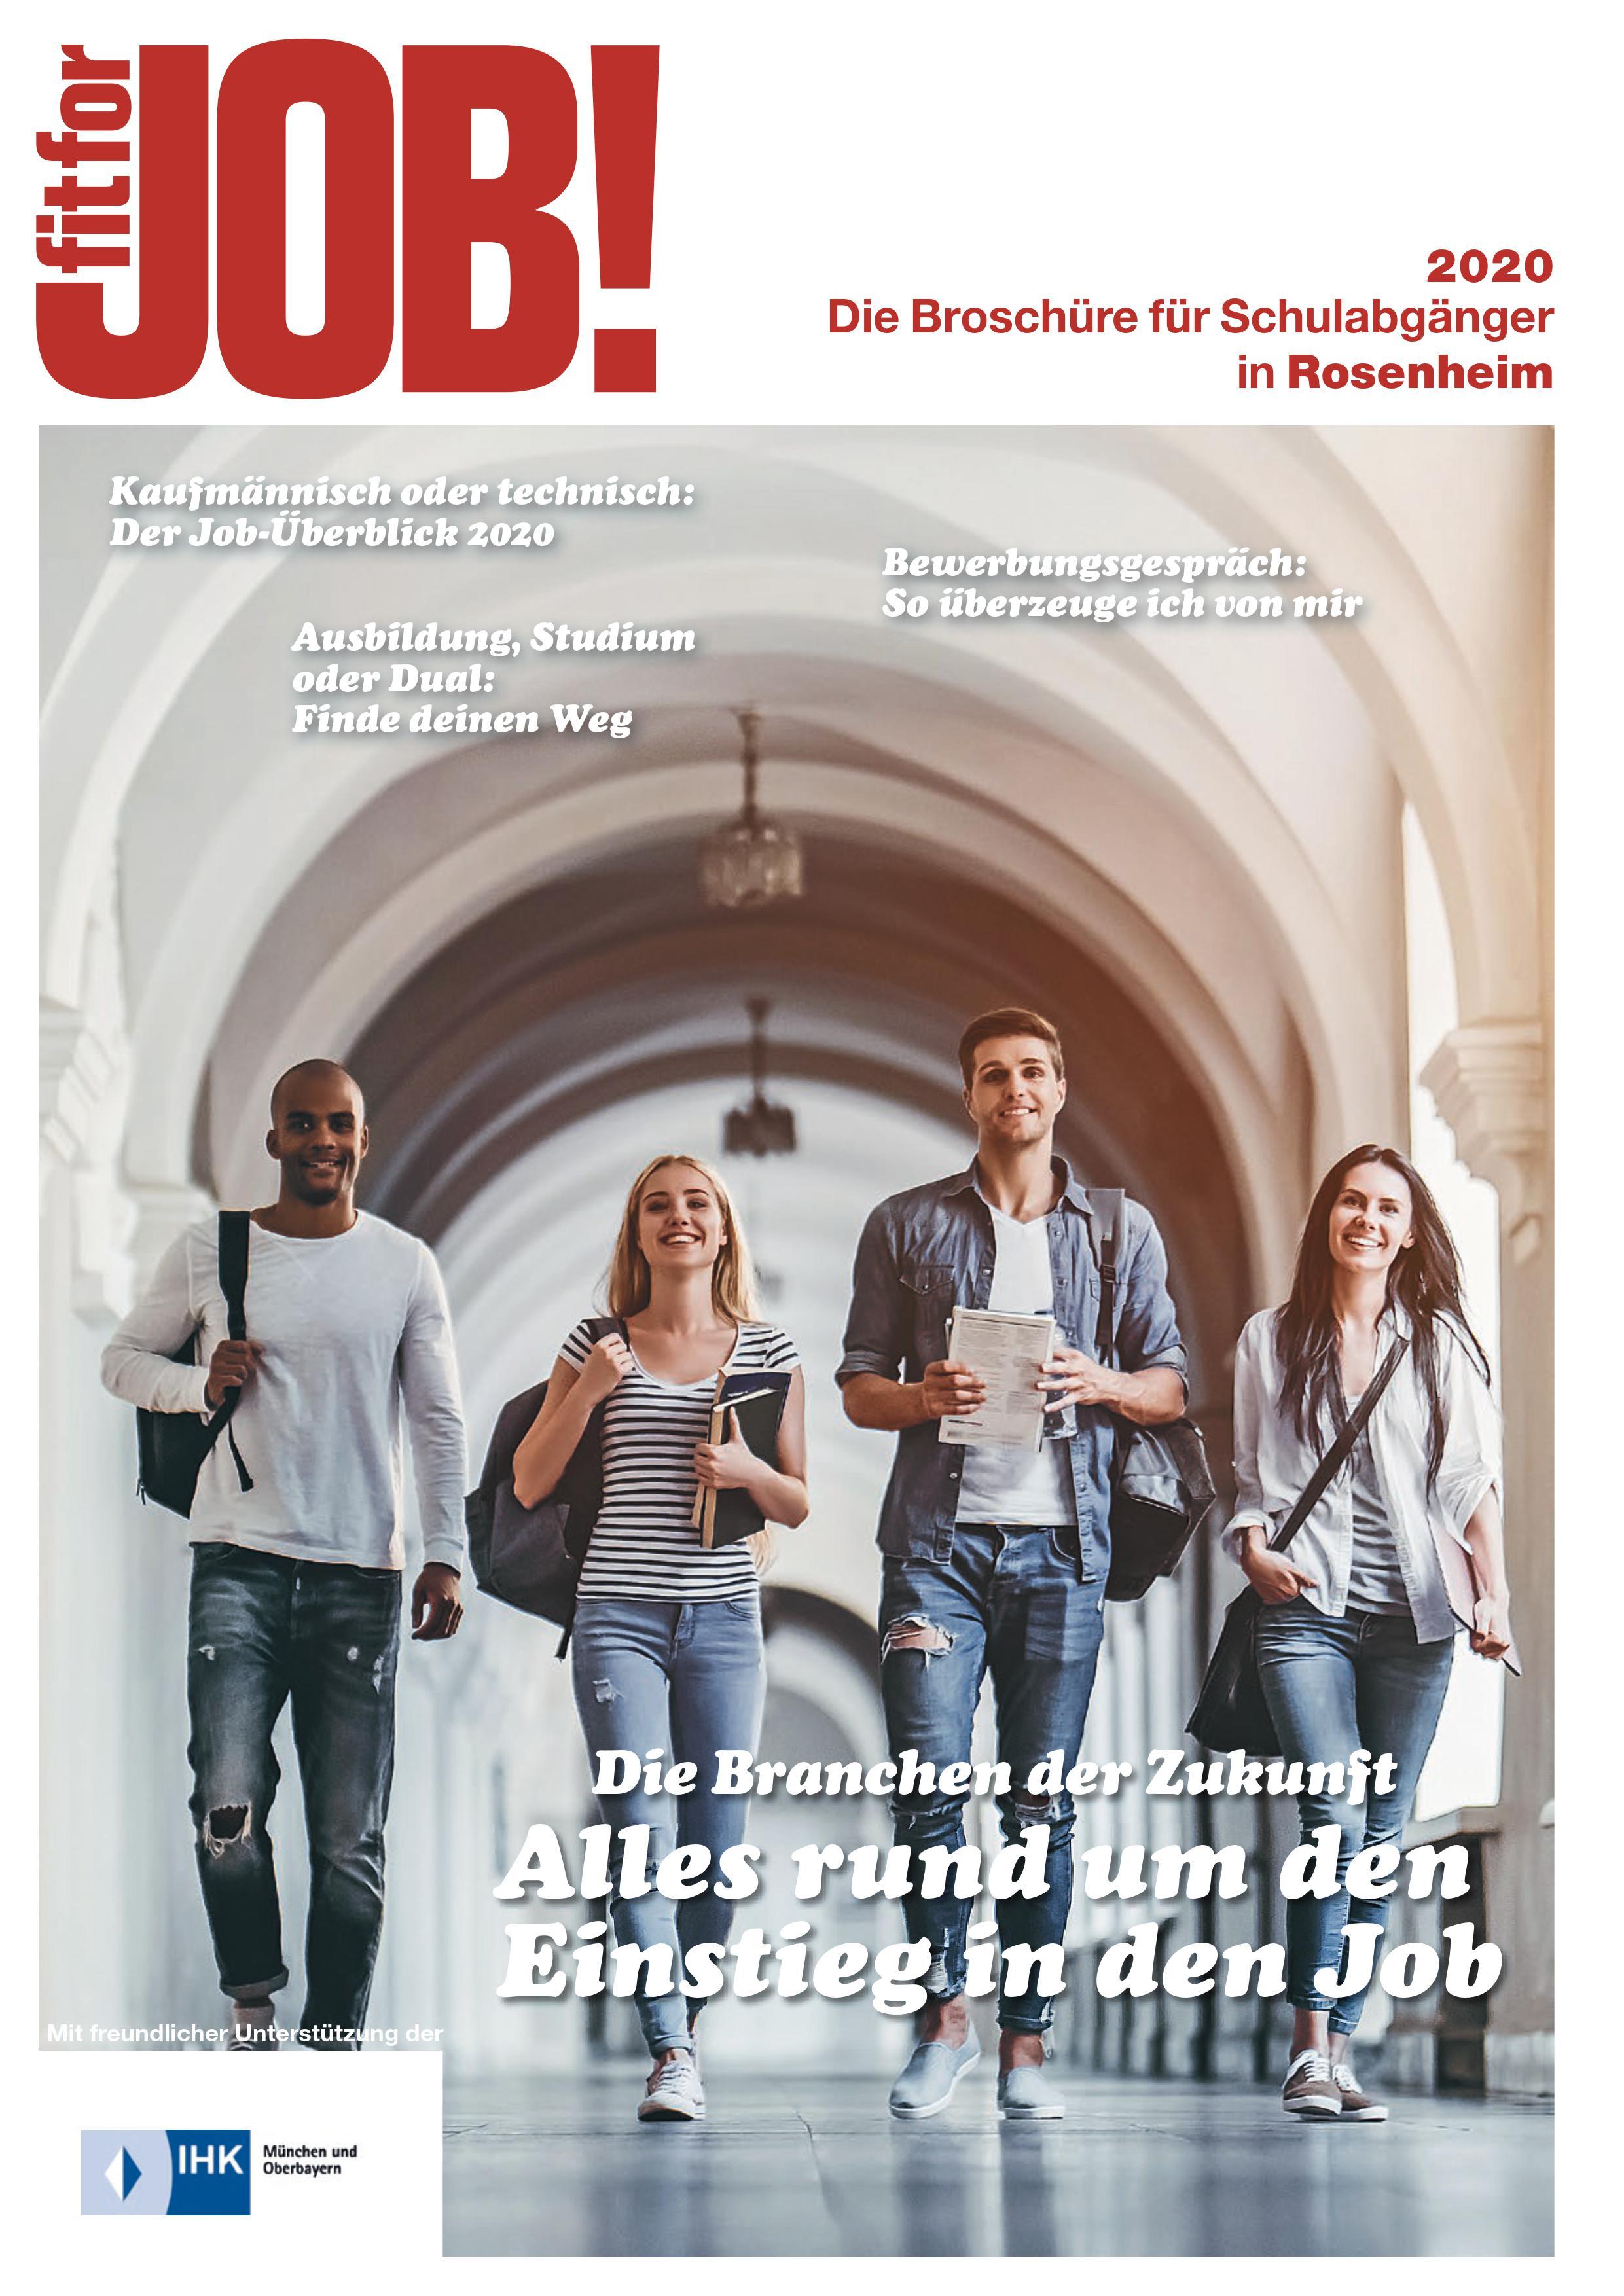 https://fitforjob-oberbayern.de/wp-content/uploads/2019/09/Rosenheim-2020.jpg